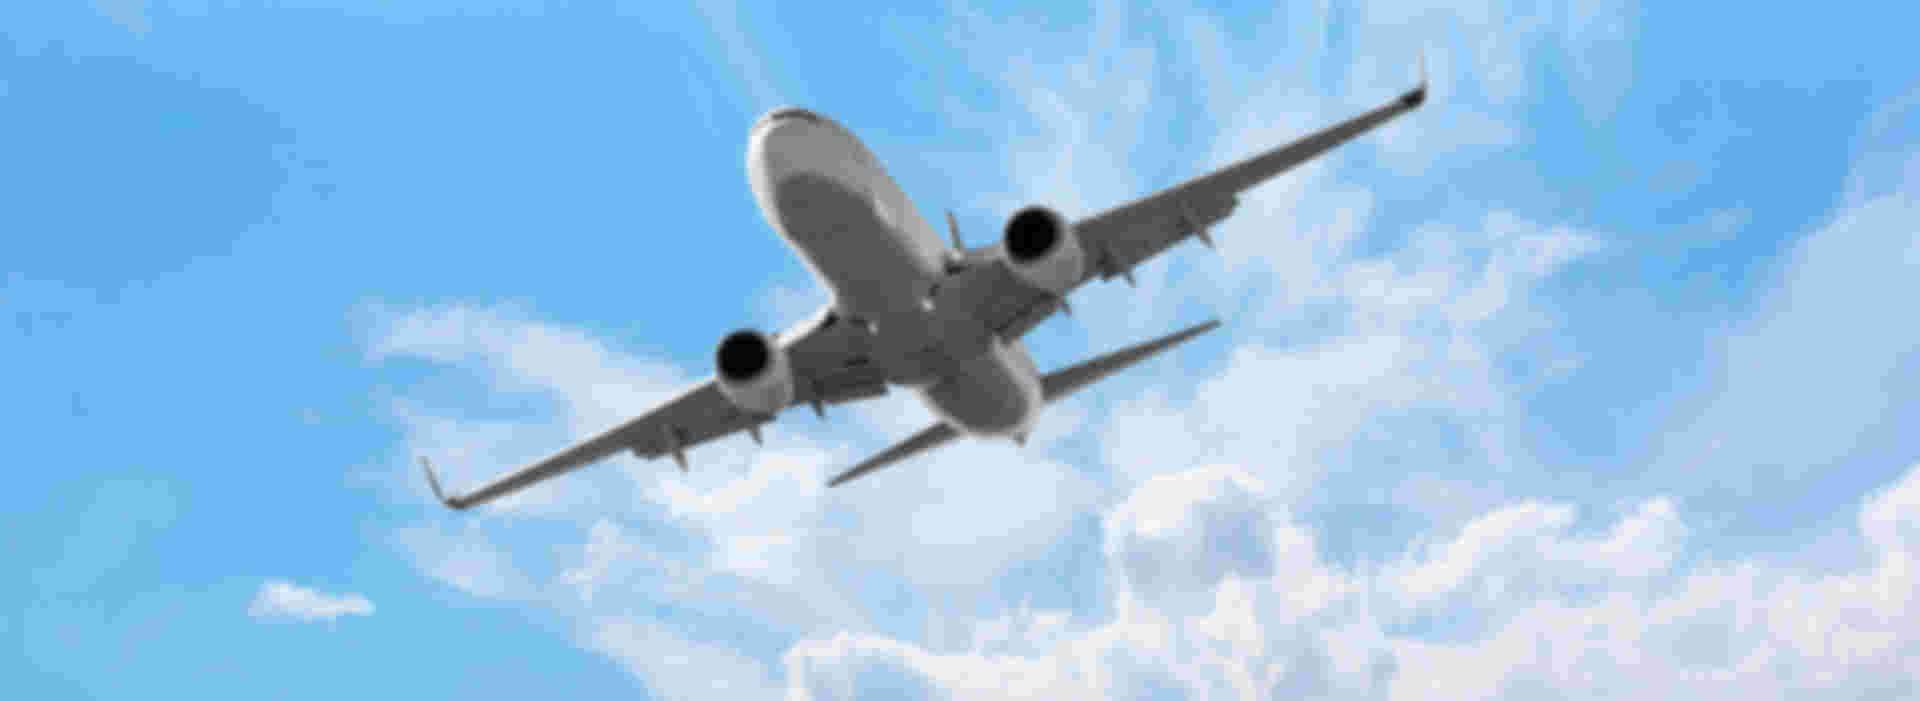 An aeroplane soaring through the skies